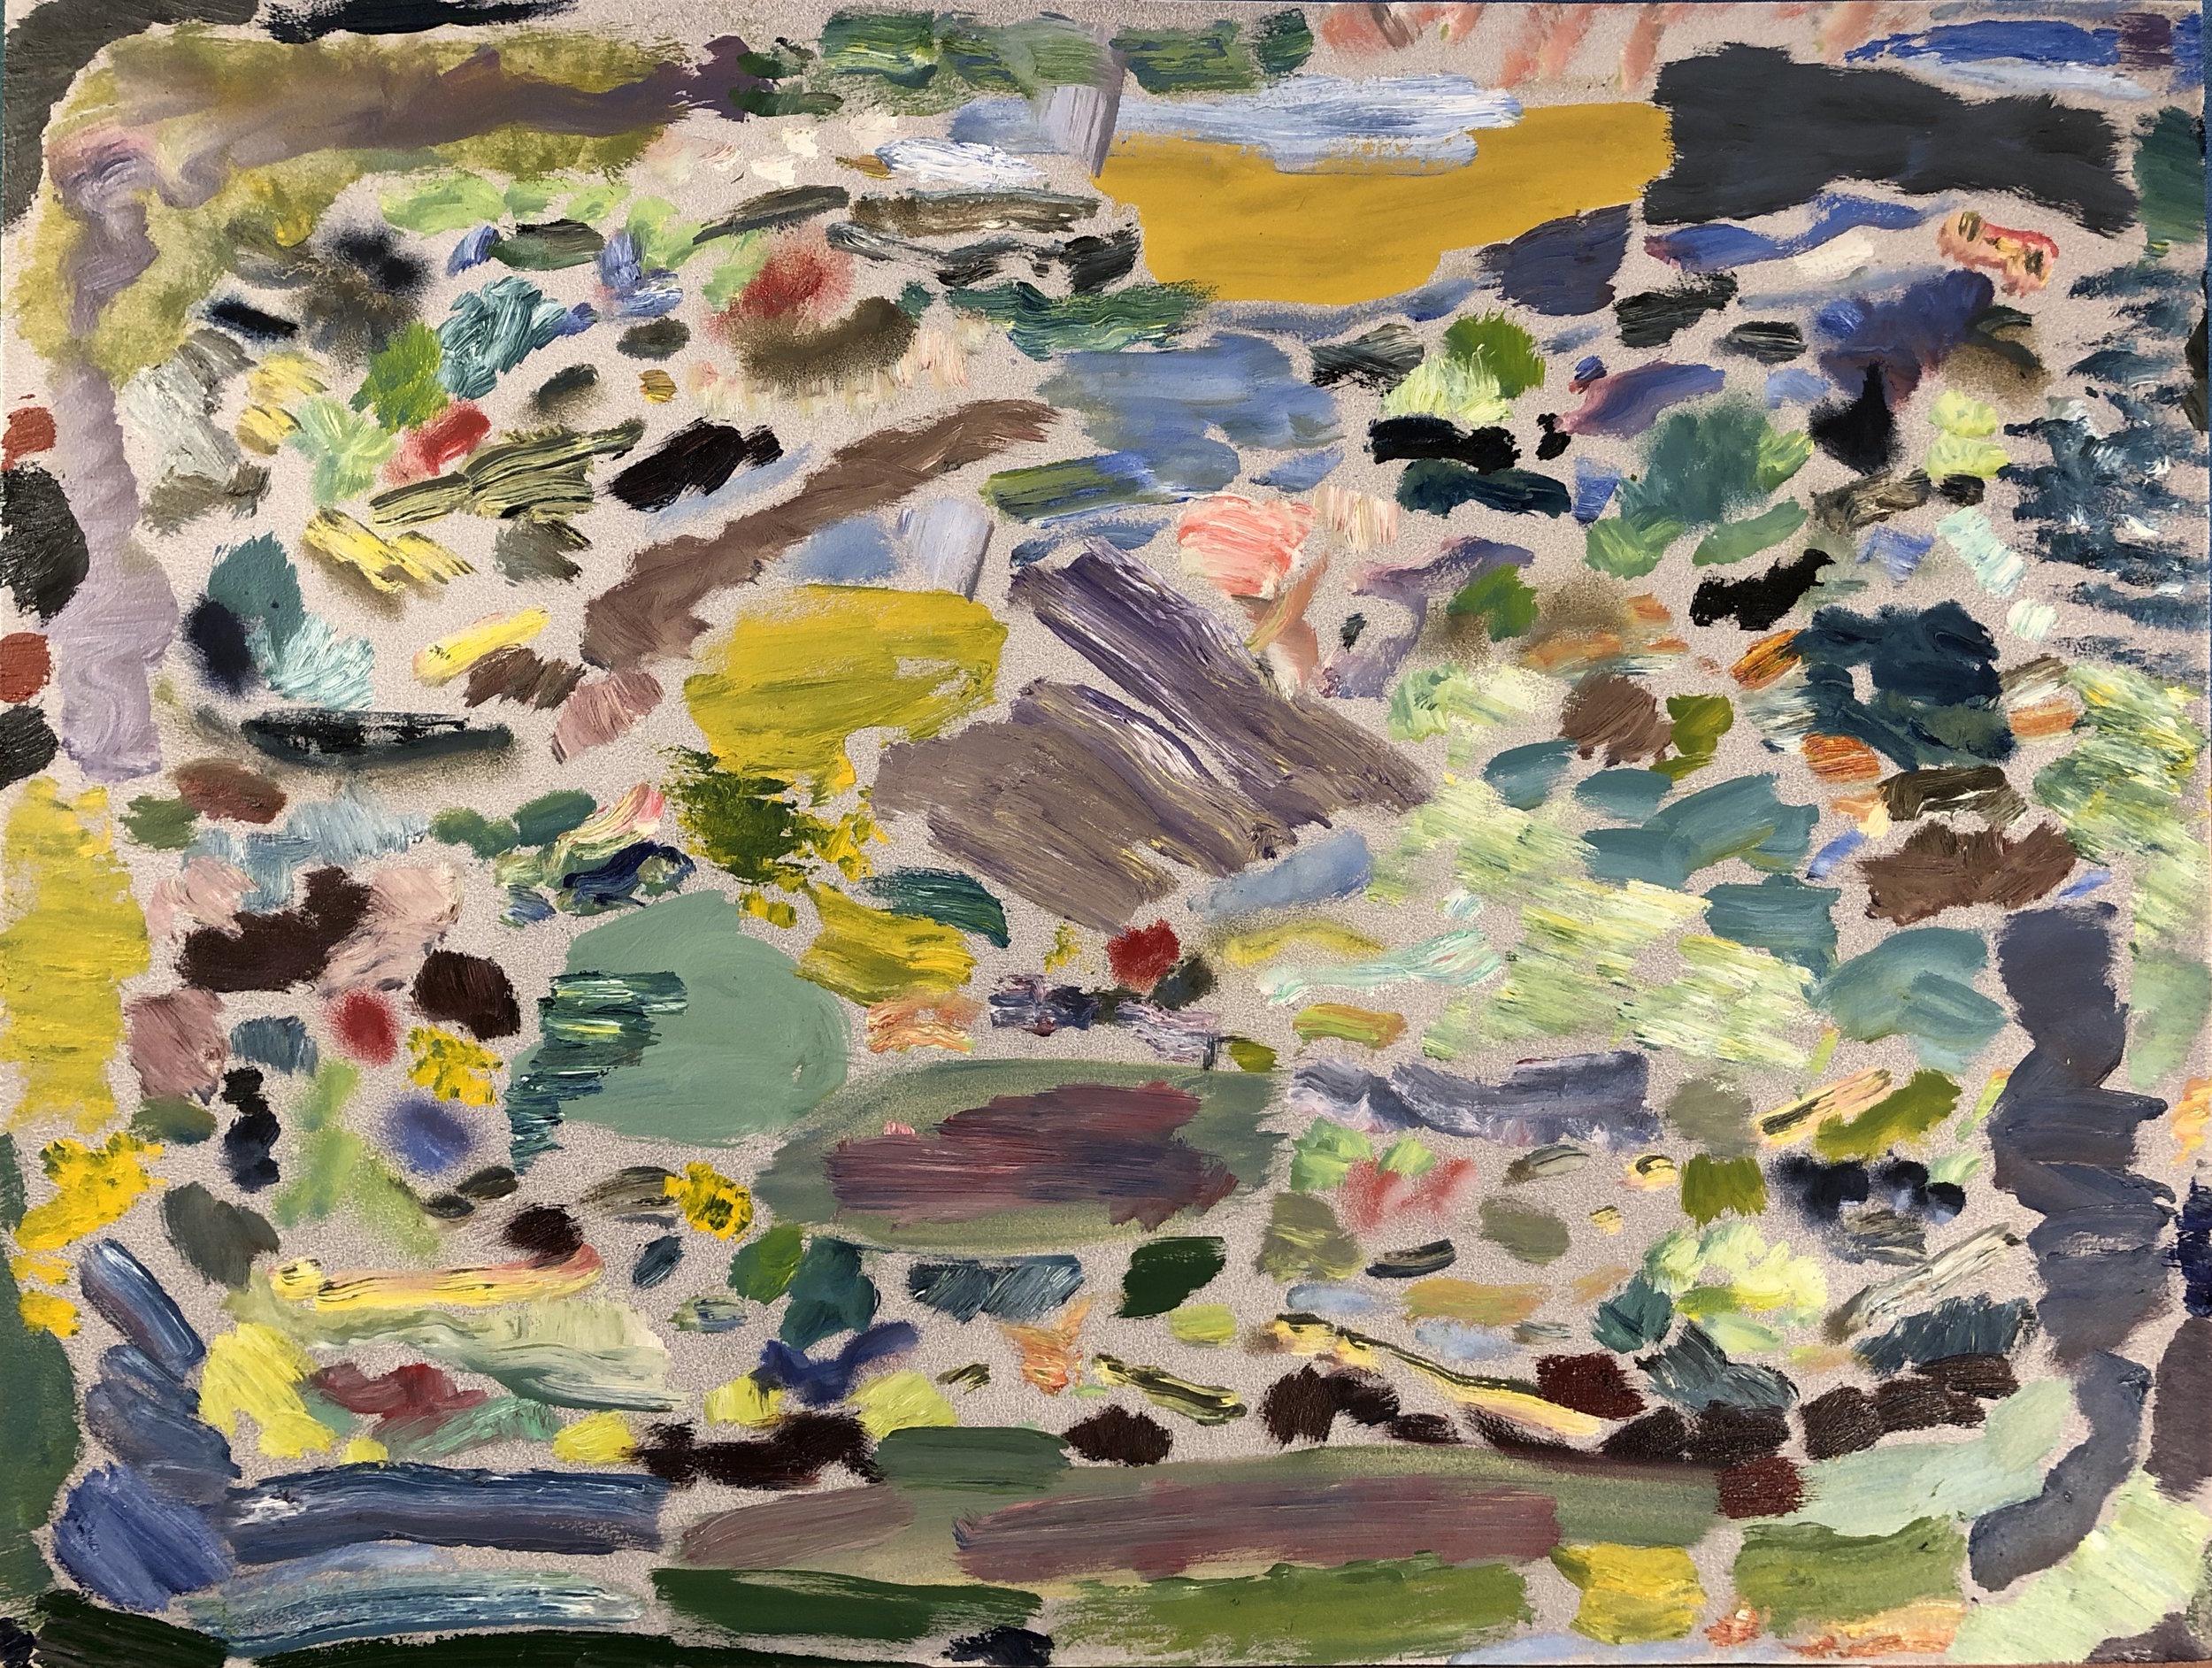 Landscape, Aerial 2, 2018